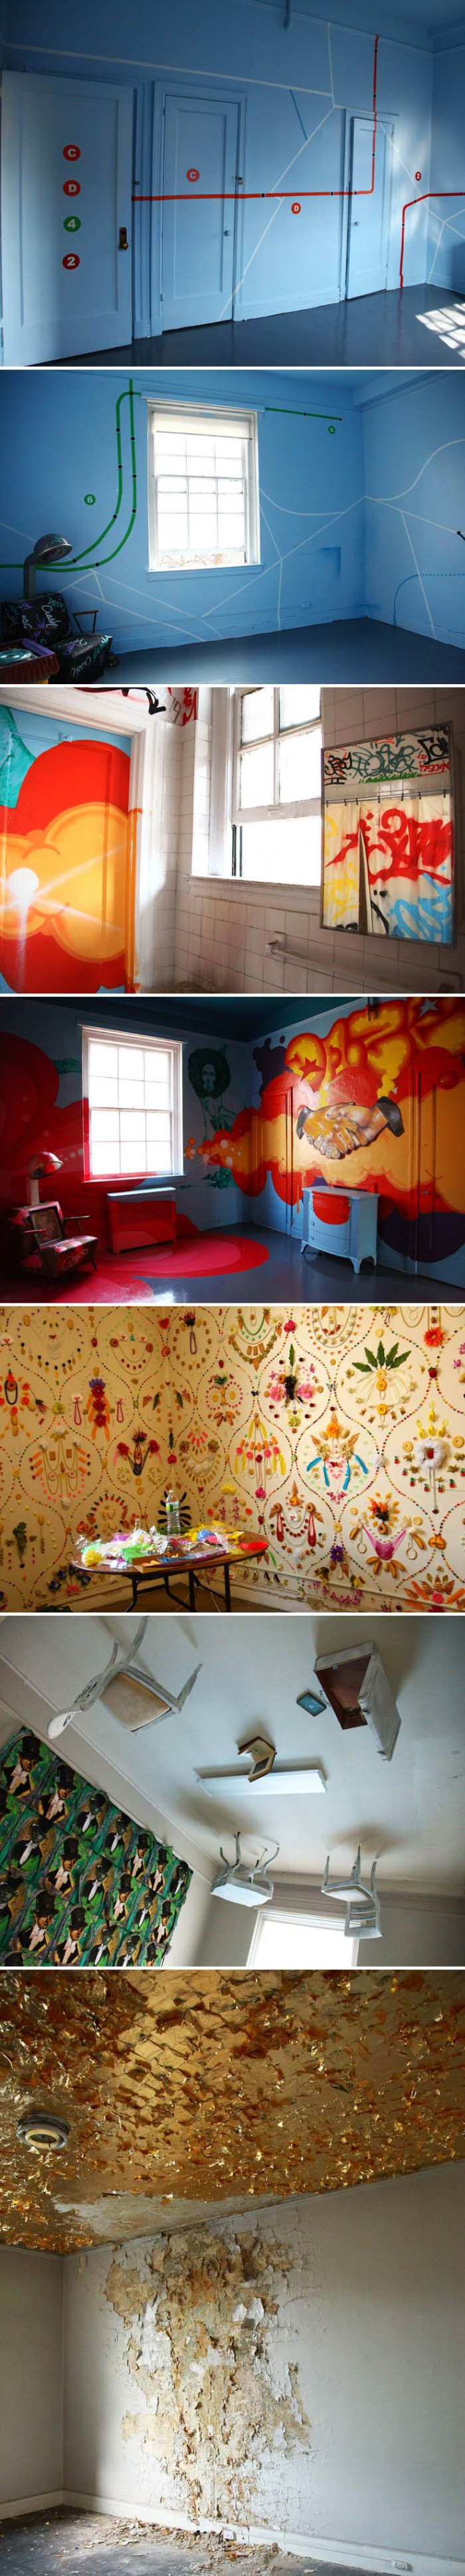 Bronx Senior Citizens Home revitalized with street artist's site-specific works, No Longer Empty, Andrew Freedman Home, Crash, How and Nosm, Daze, Cheryl Pope, Adam Parker Smith